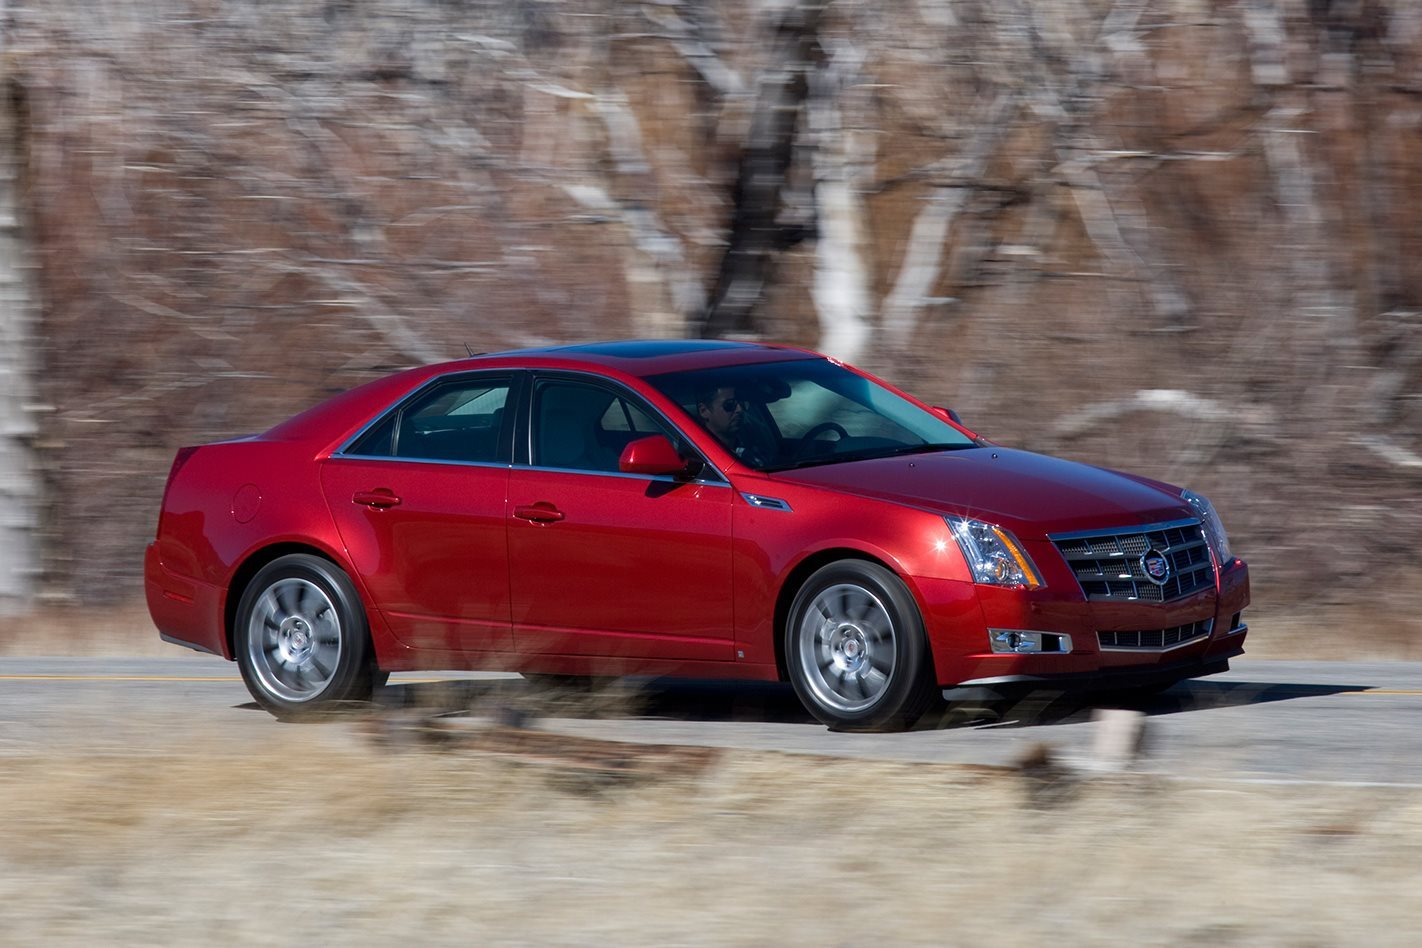 Cadillac-CTS-side.jpg